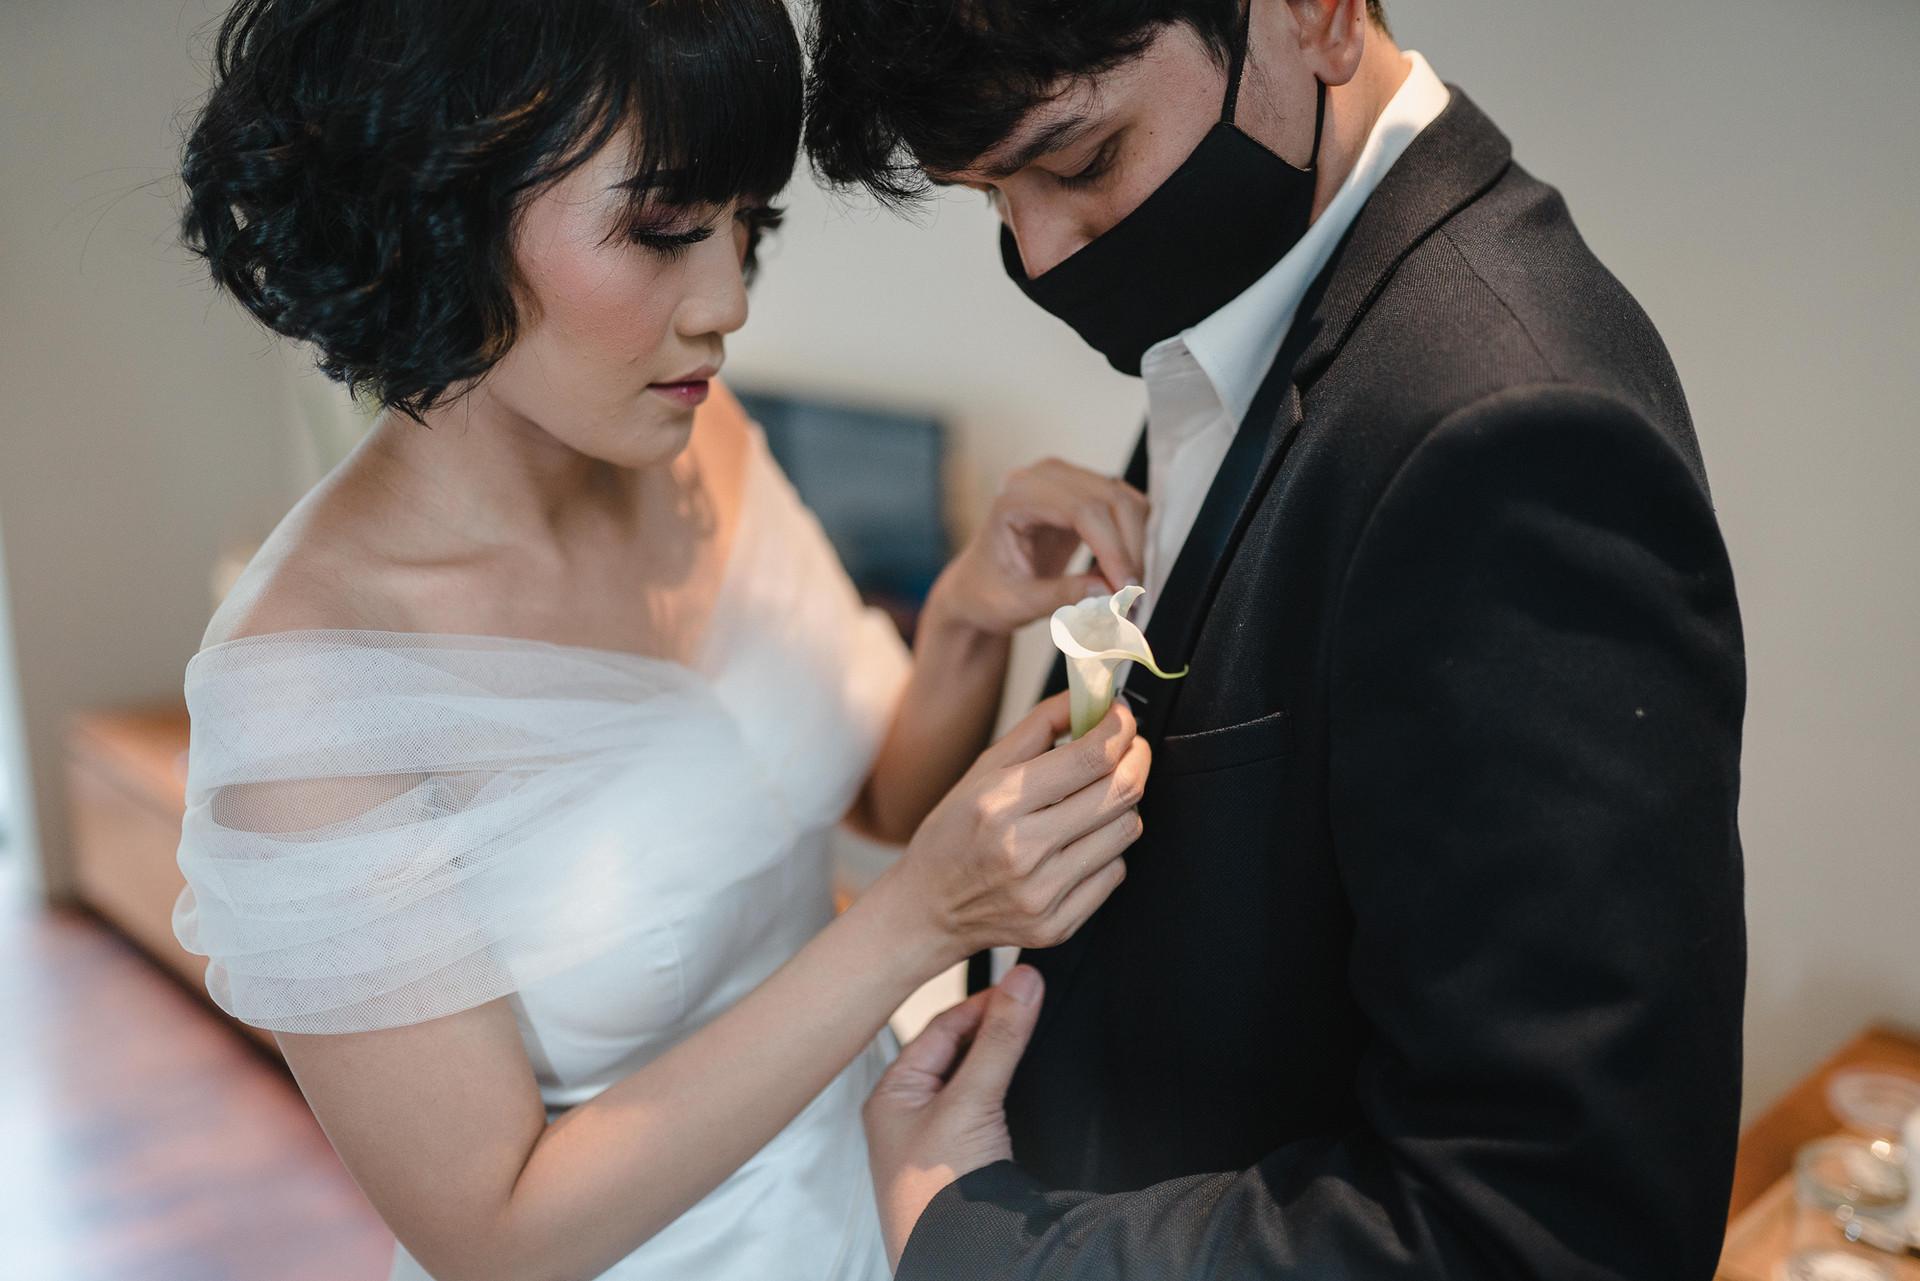 ALIF-WEDHA-WEDDING-1.jpg